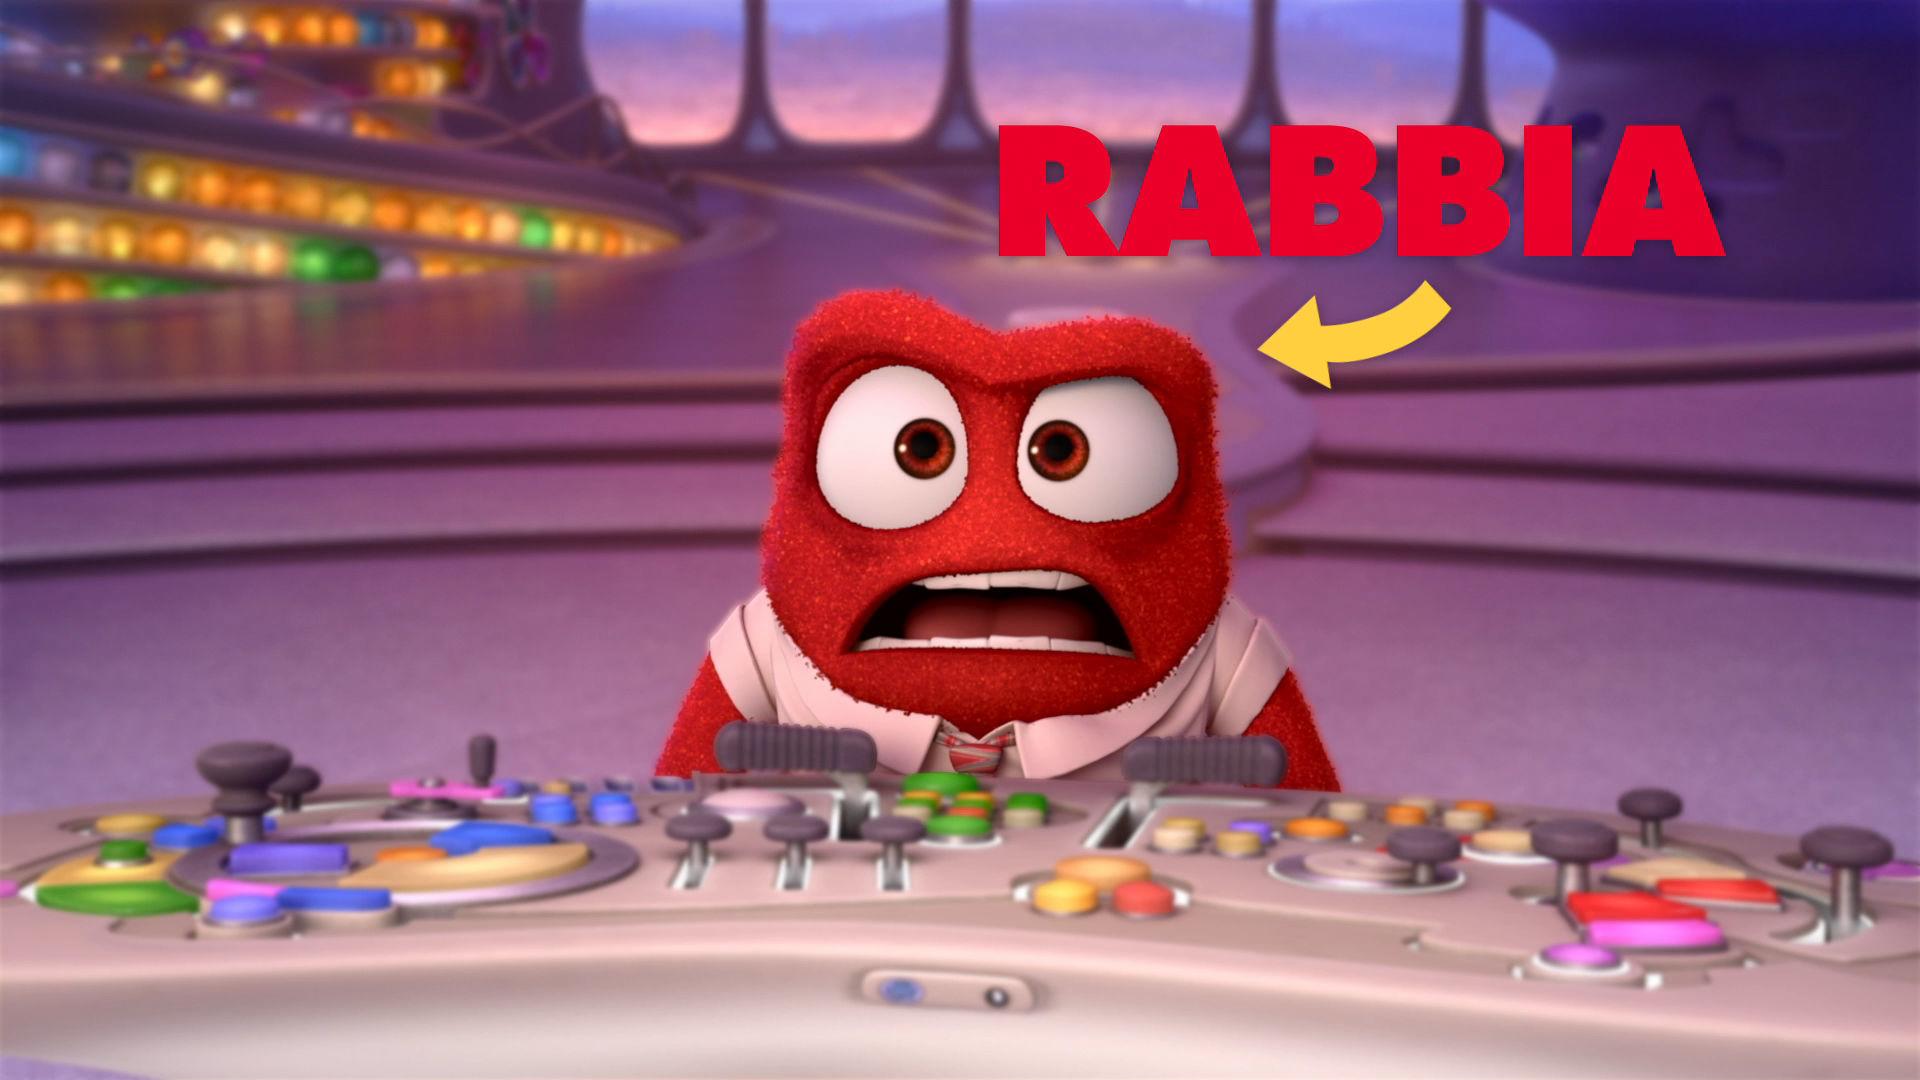 Inside Out - (Ri)Conosci Rabbia